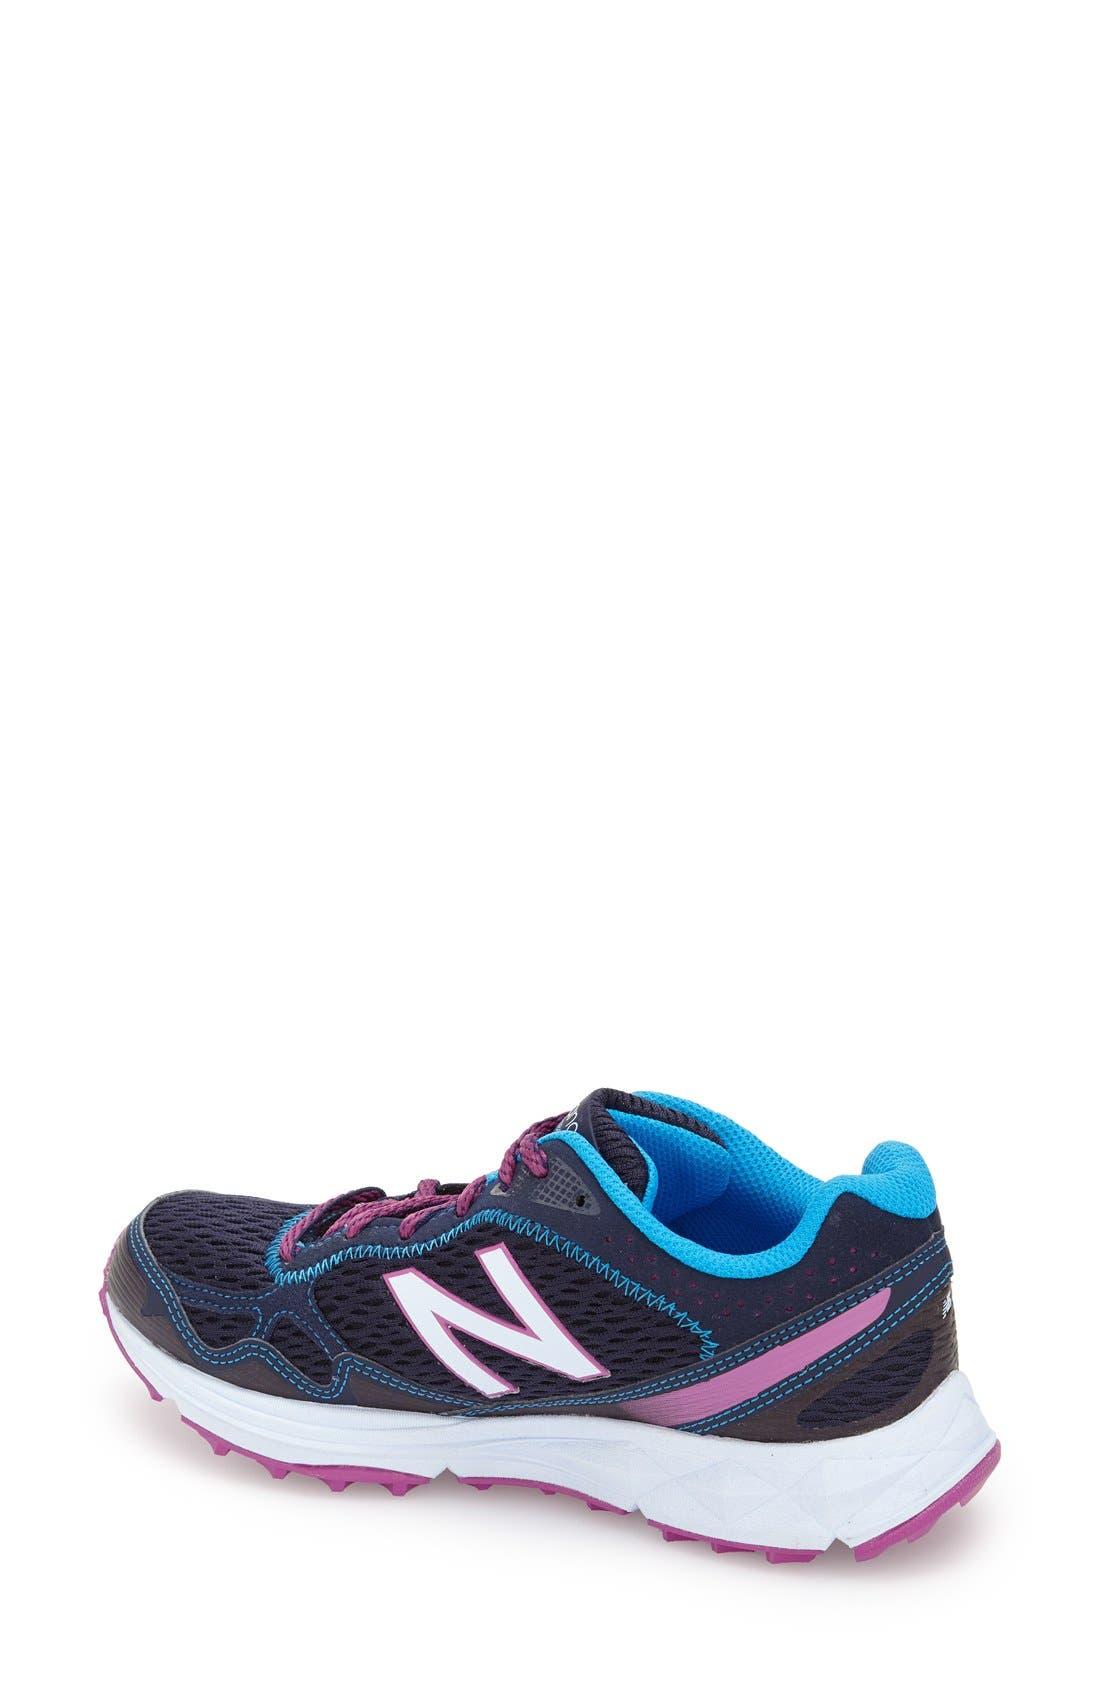 Alternate Image 2  - New Balance '910' Trail Shoe (Women)